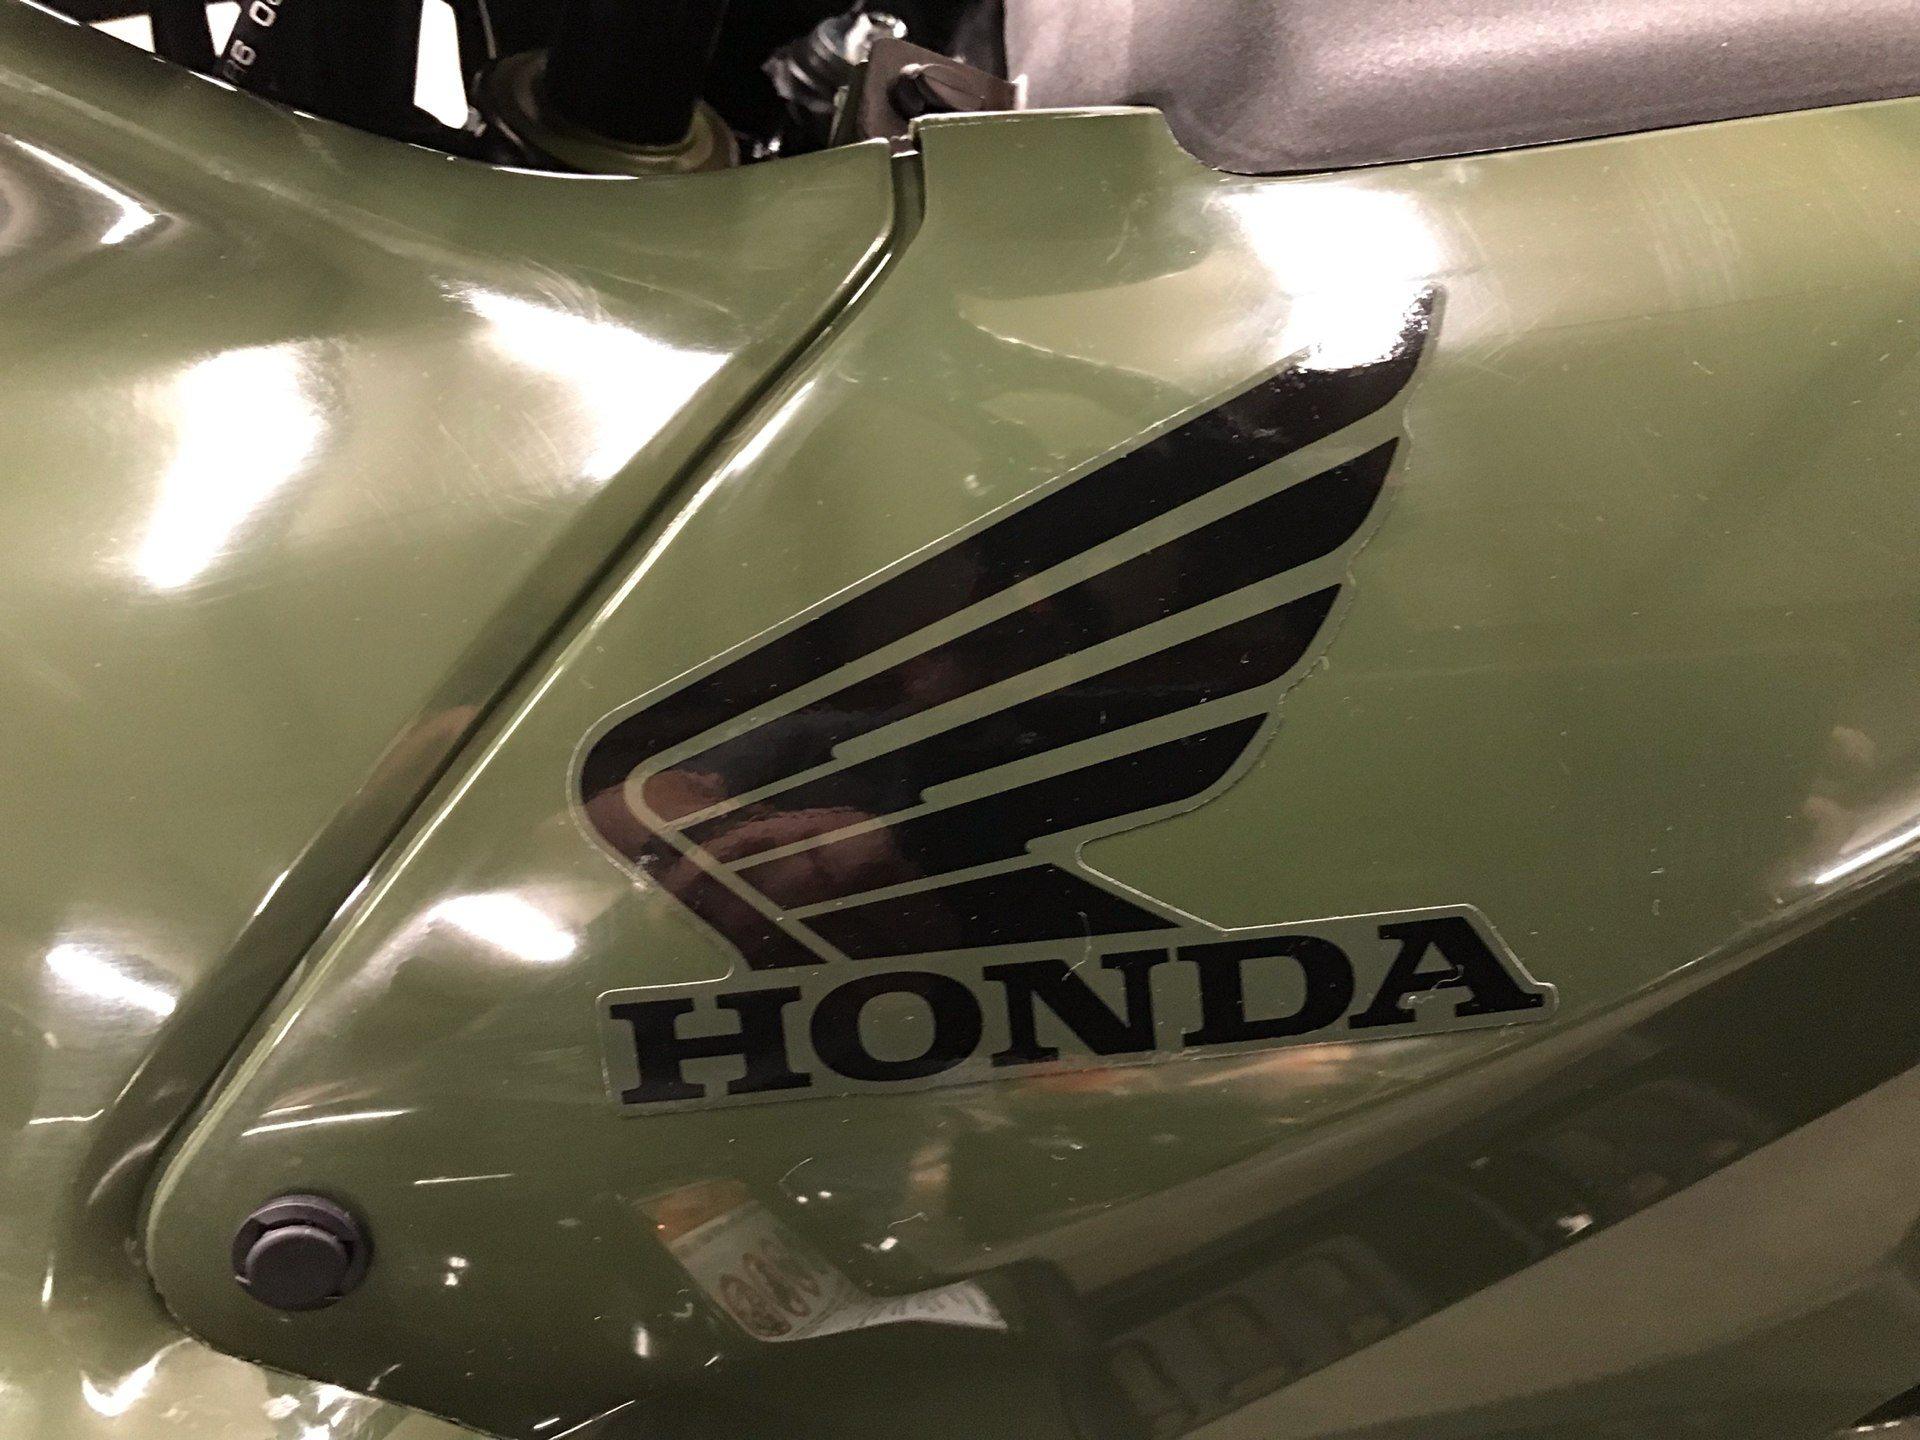 2019 Honda FourTrax Recon 11